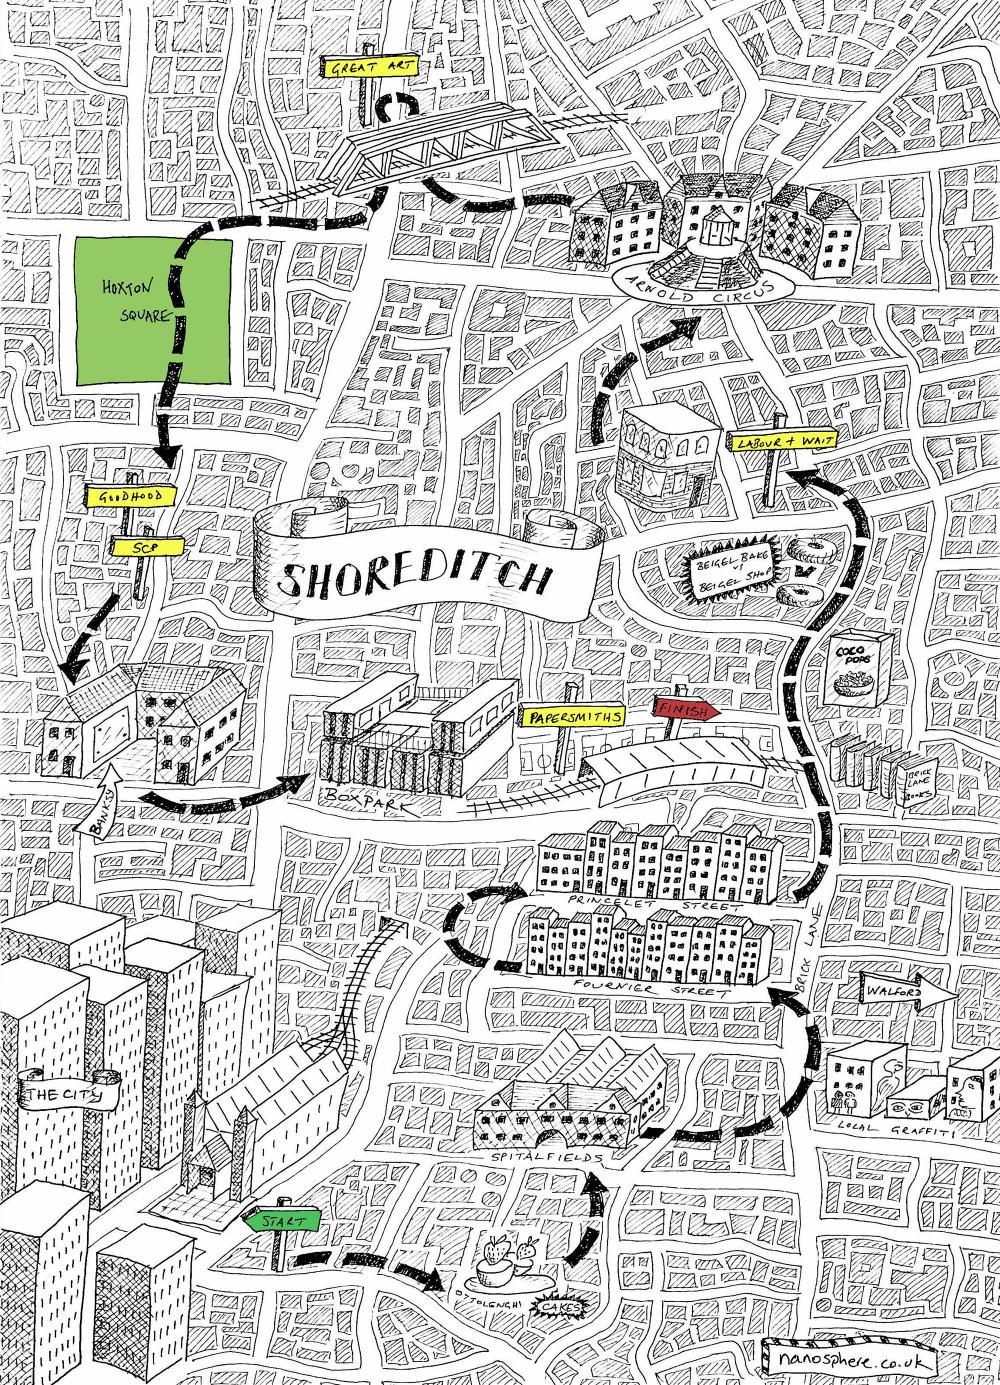 London Map Shoreditch Area: Stationery Shop Walks #4 – Shoreditch, London